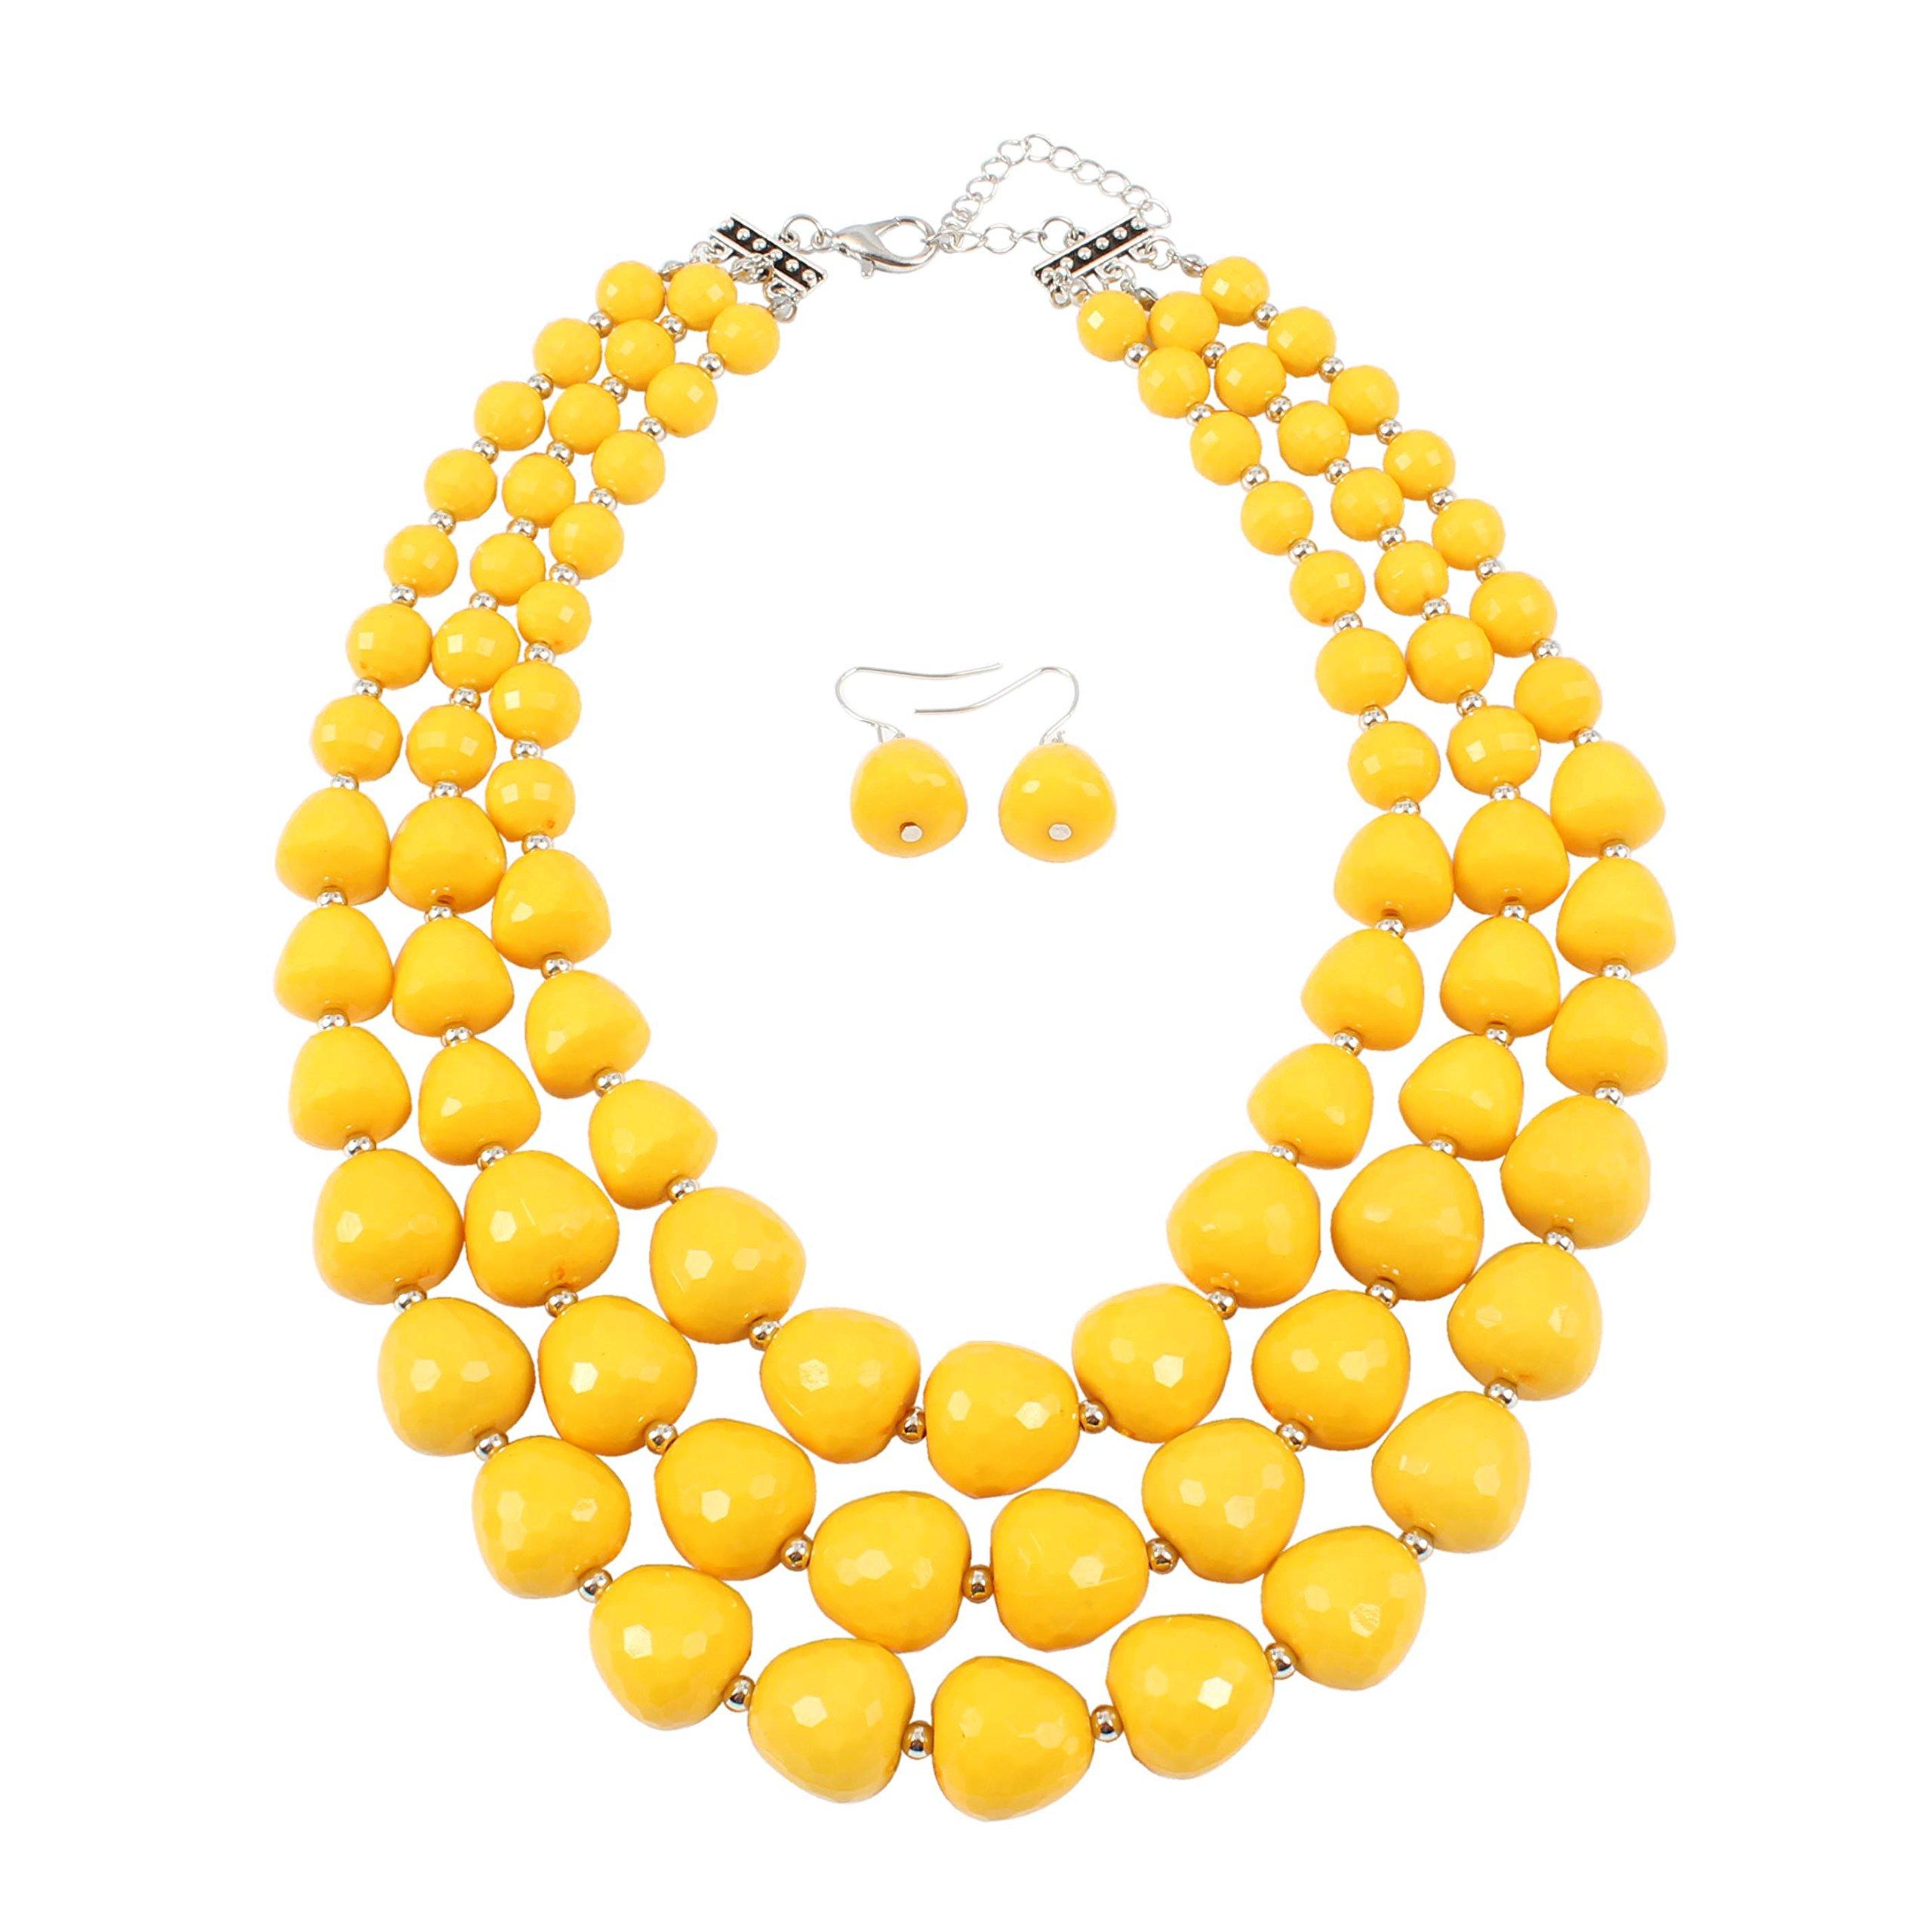 KOSMOS-LI 3 Layer Acrylic Yellow Bead Multi Strand Necklace